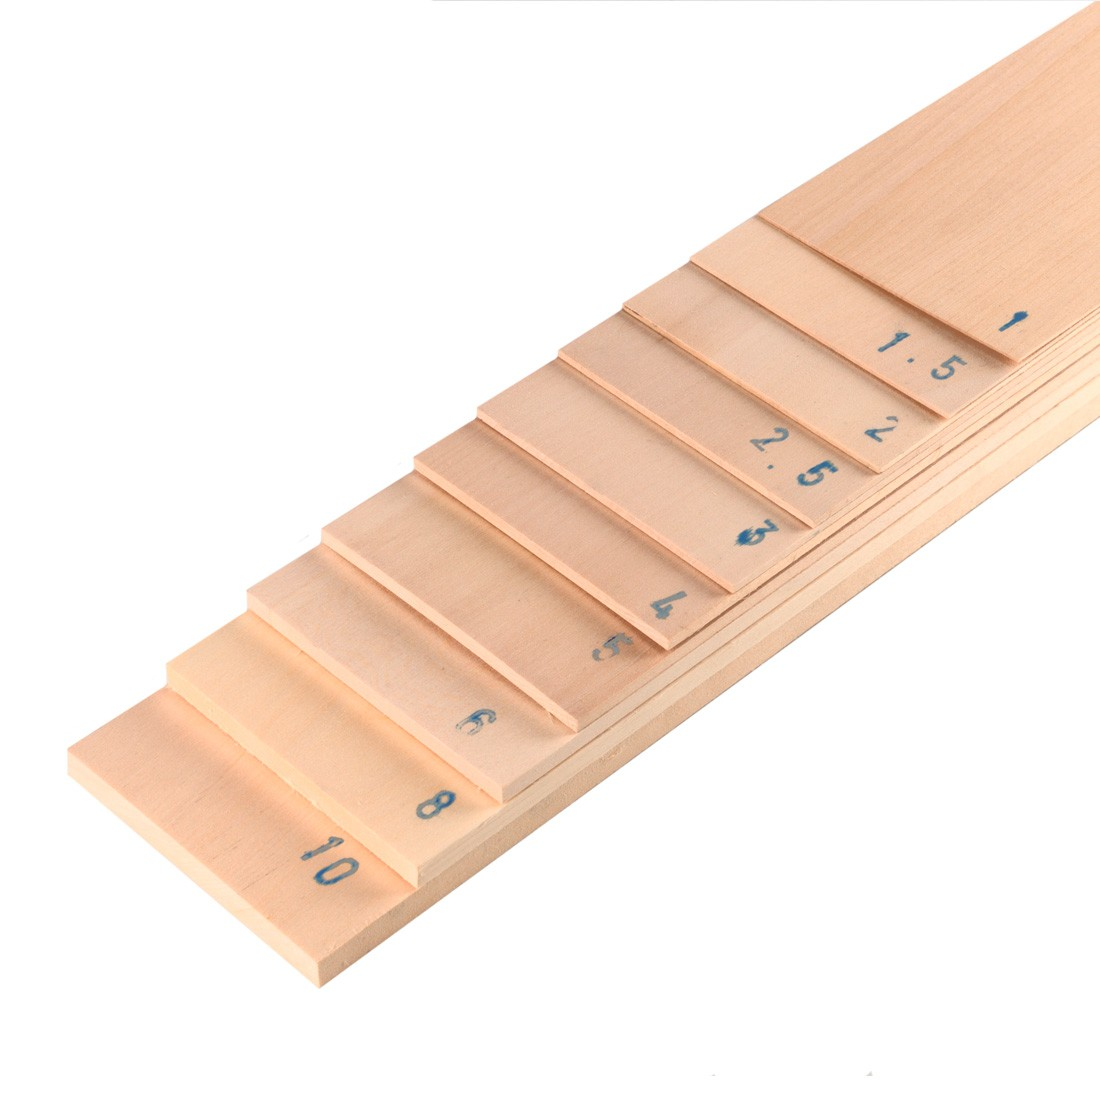 Planche tilleul mm.1x100x1000